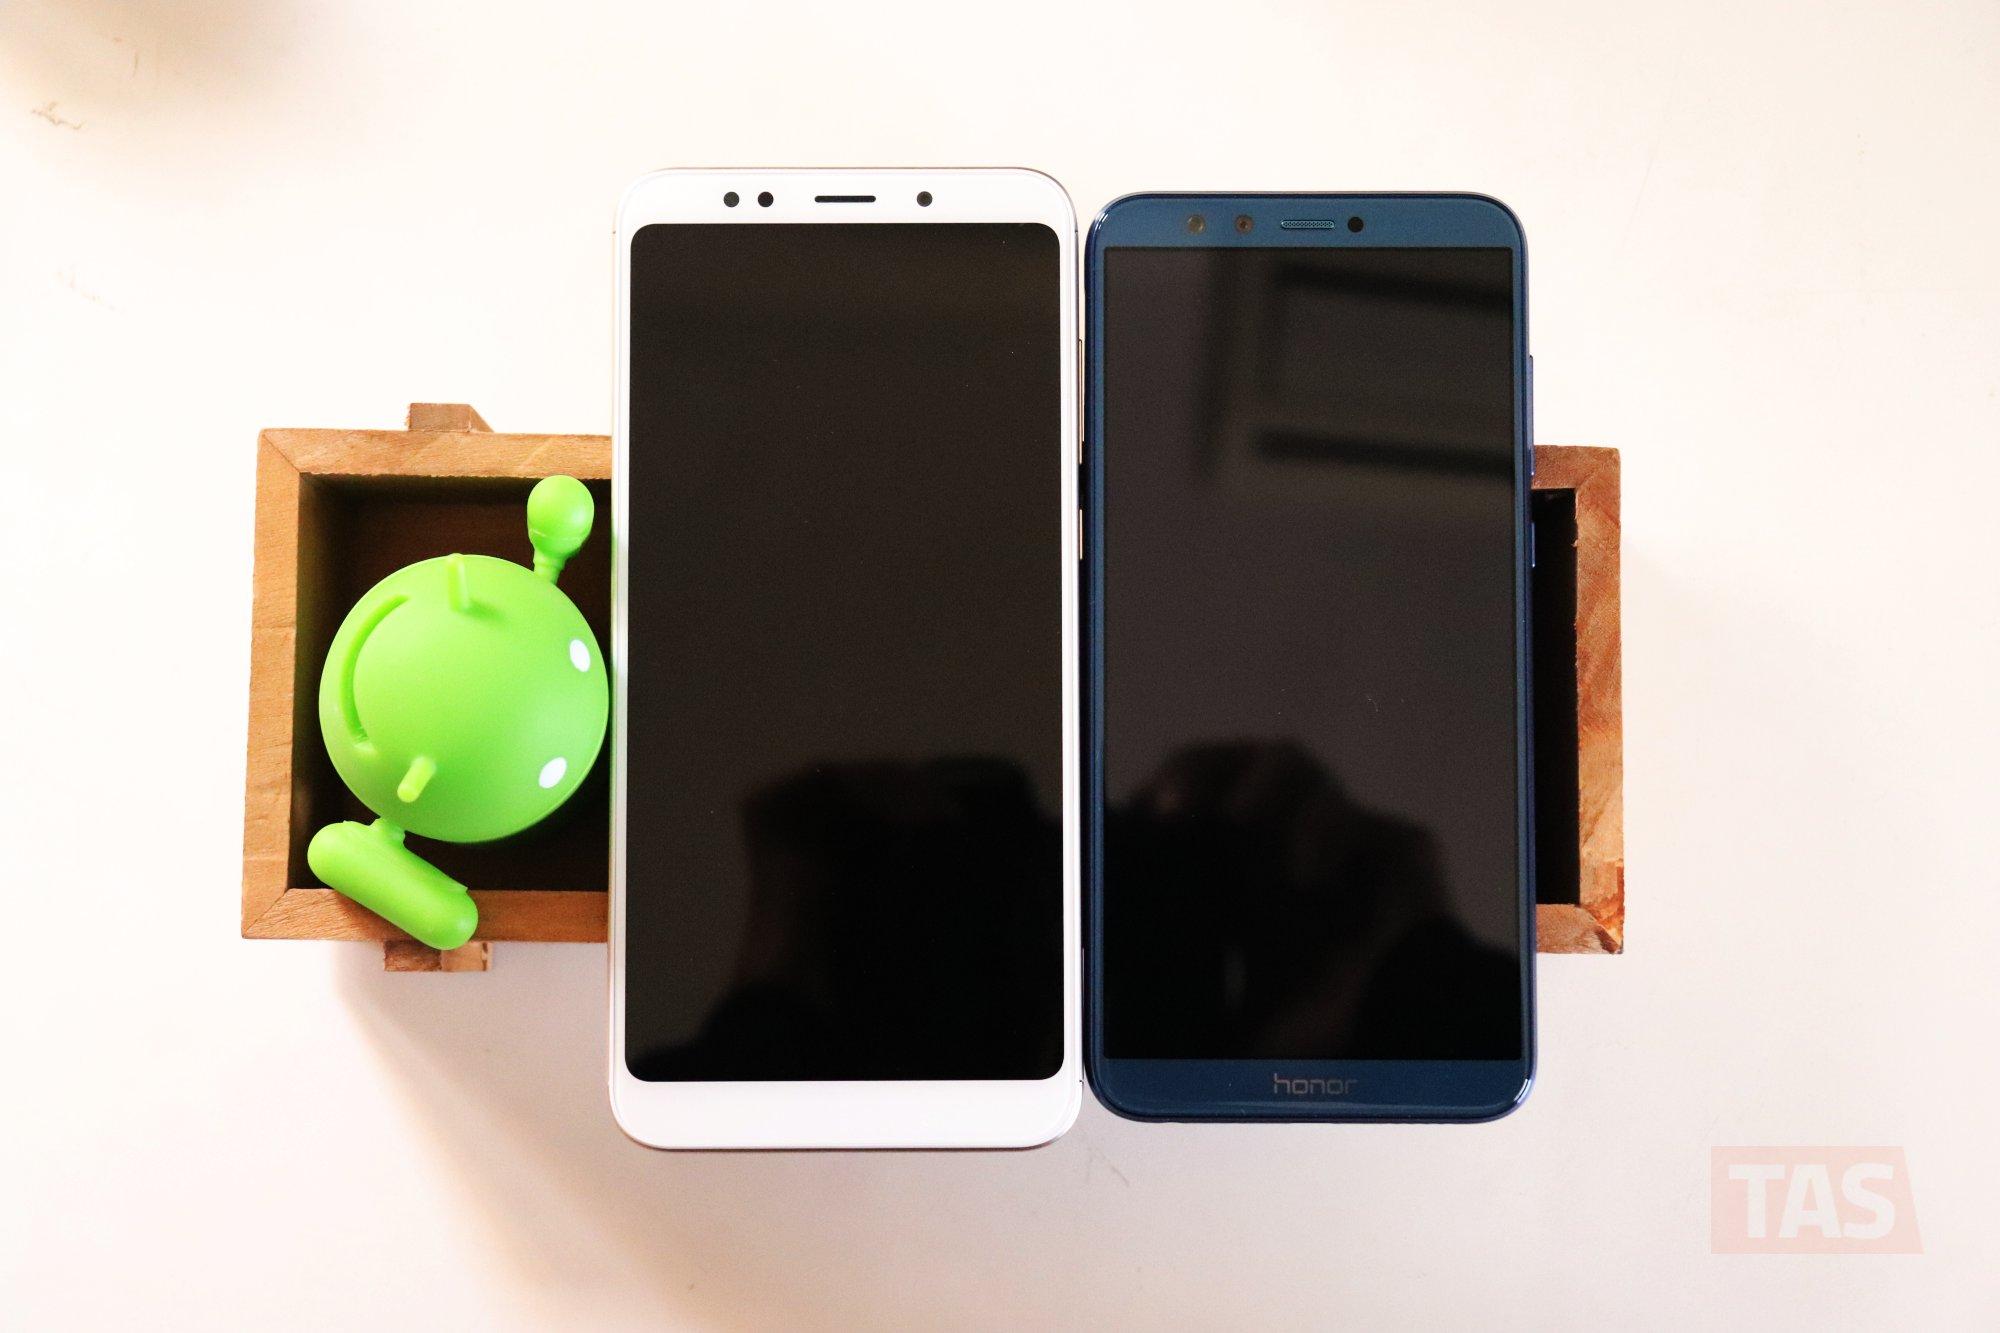 Xiaomi-Redmi-5-Plus-and-Honor-9-Lite-Full-front